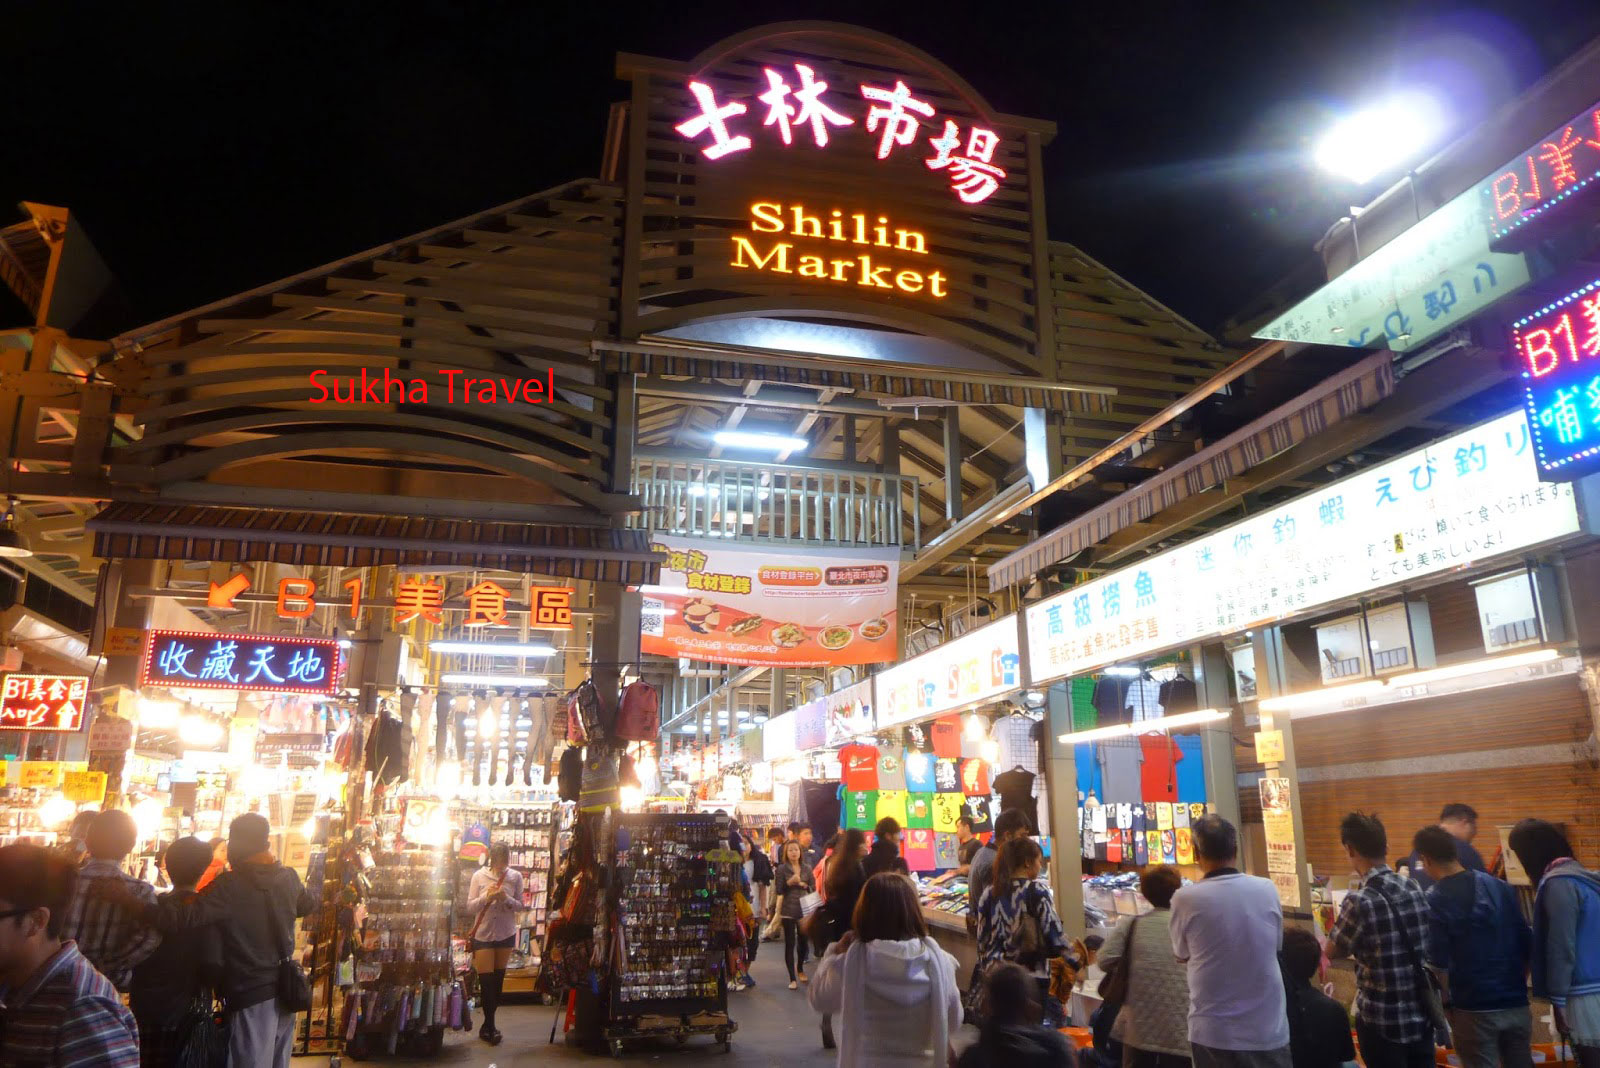 cho-dem-thach-lam-dai-bac-sukha-travel